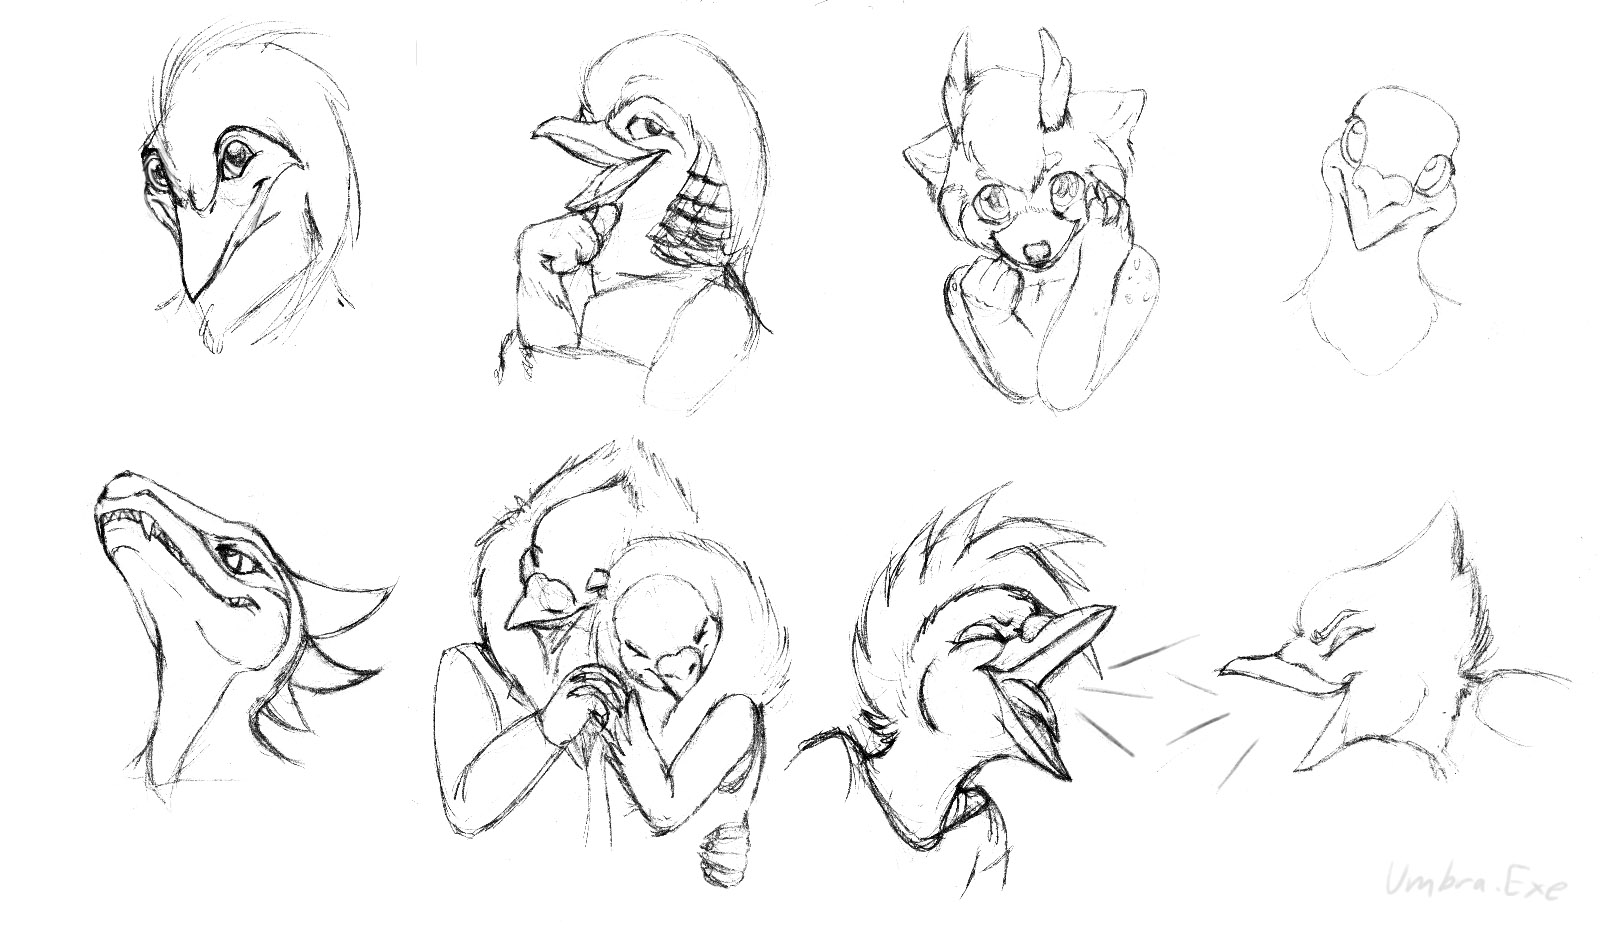 head sketches 1 birds a pandeer and a raptor weasyl